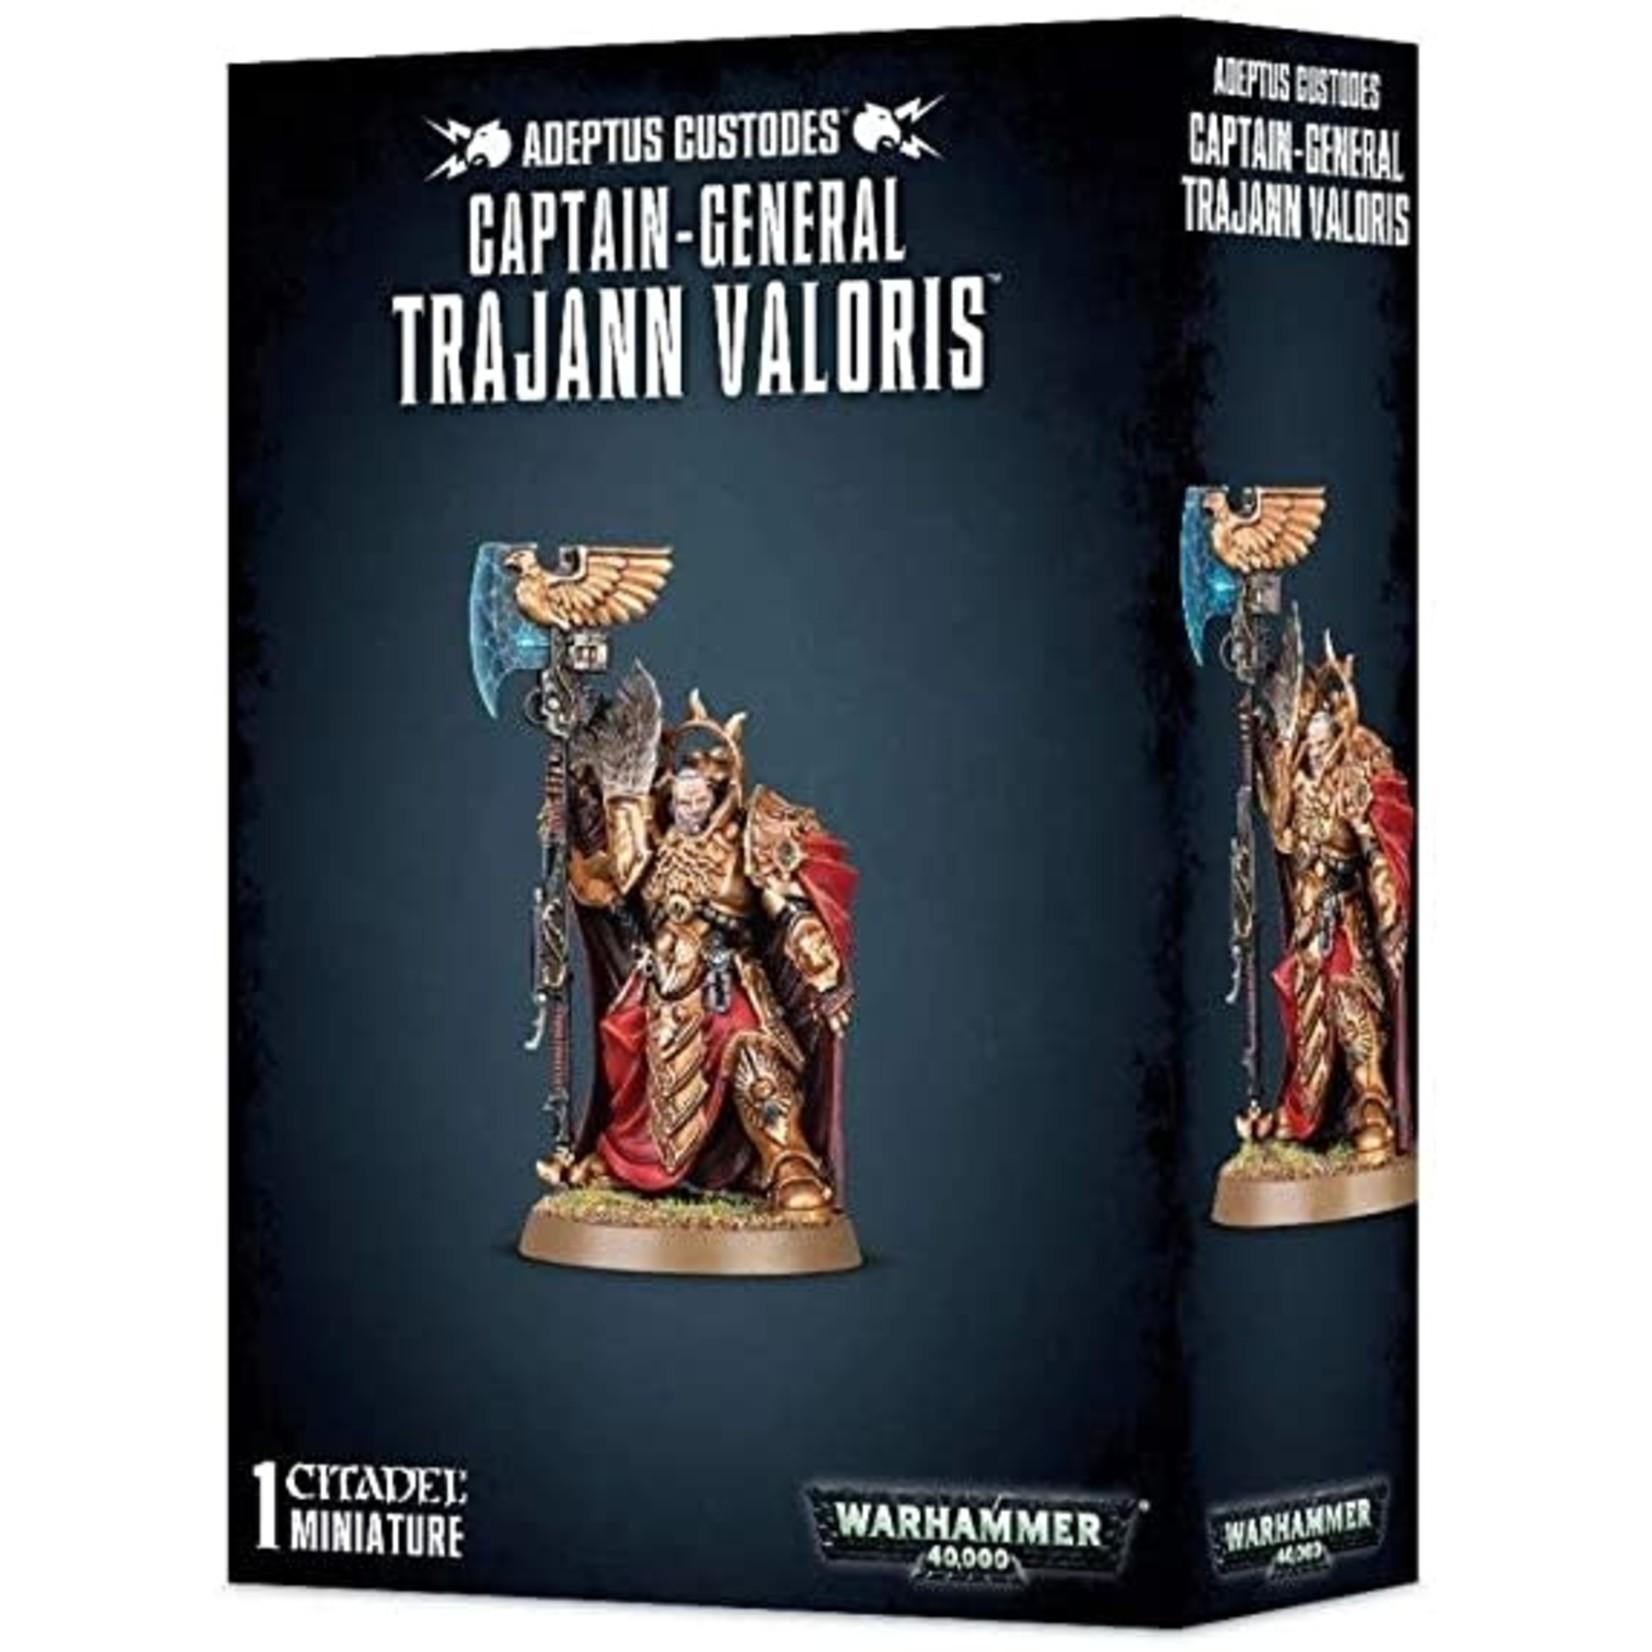 Captain-General Trajann Valoris (40K)